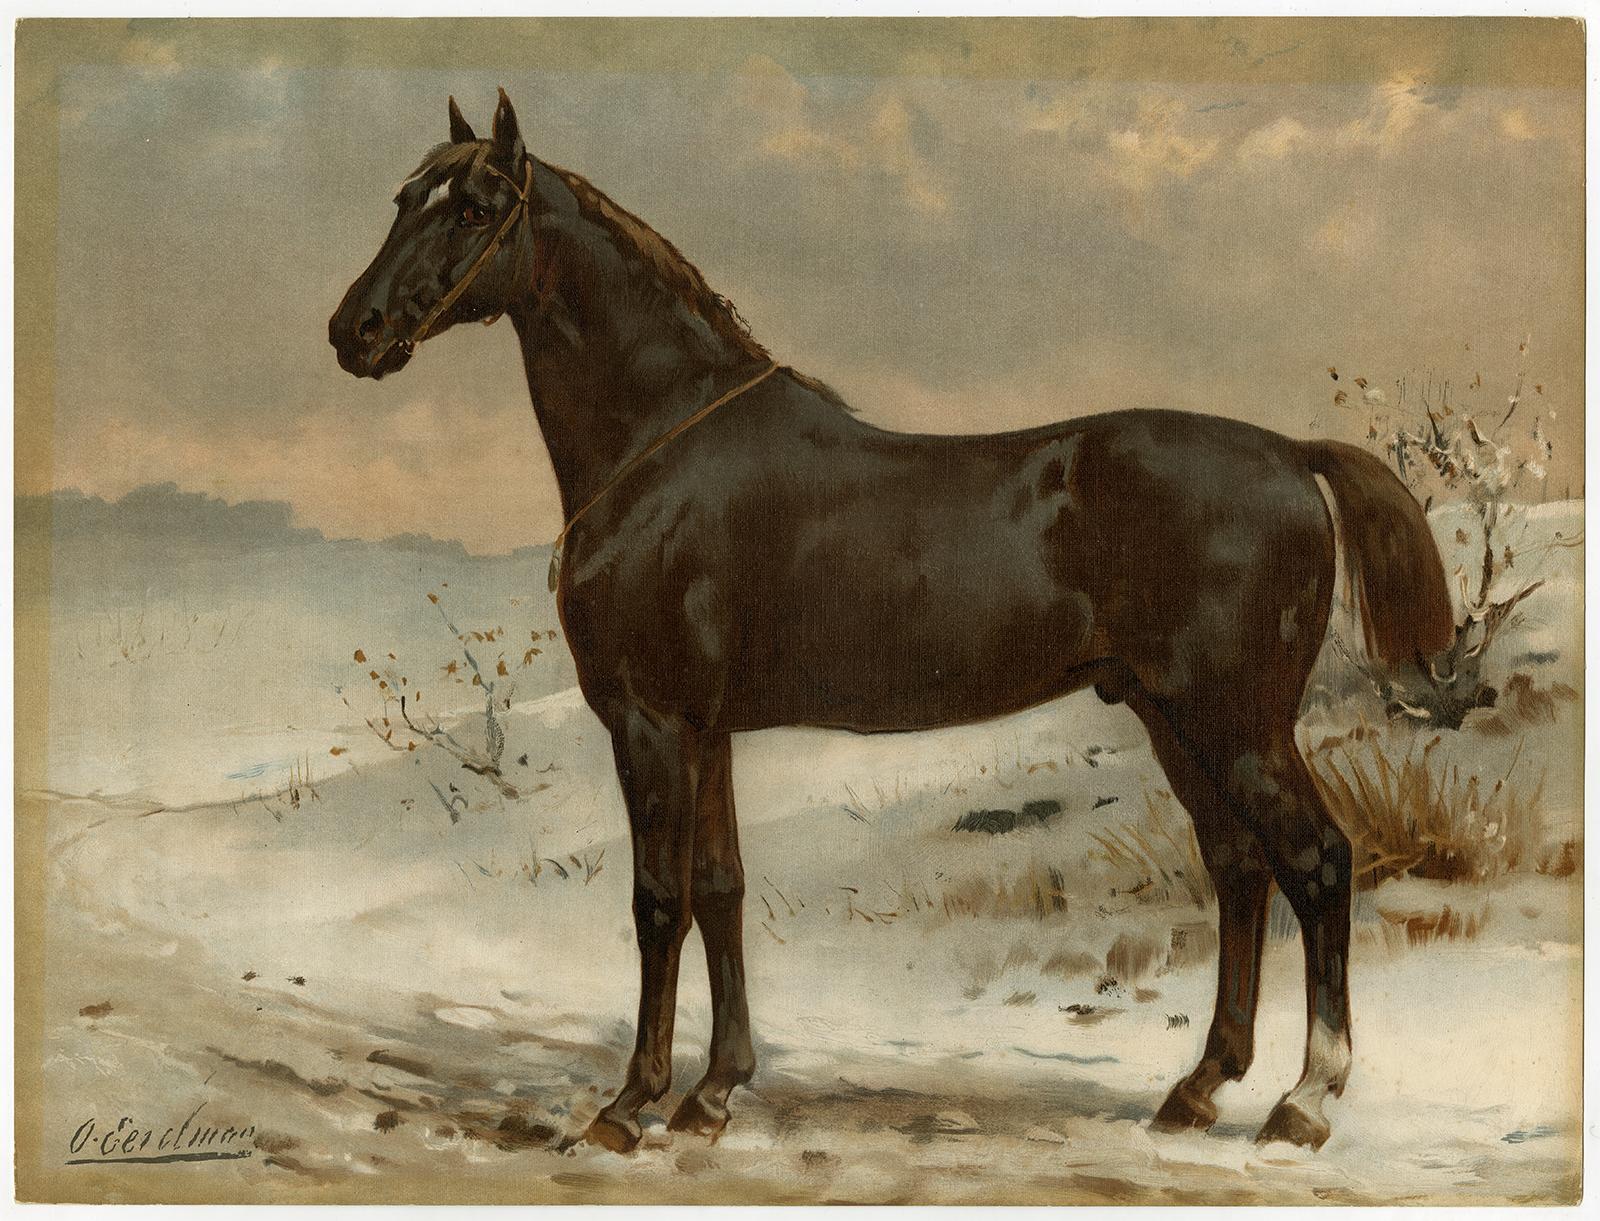 Rare Antique Print Russian Half Blood Horse Pl 27 Eerelman 1898 Kunst Nbsp Nbsp Grafik Nbsp Nbsp Poster Theprintscollector